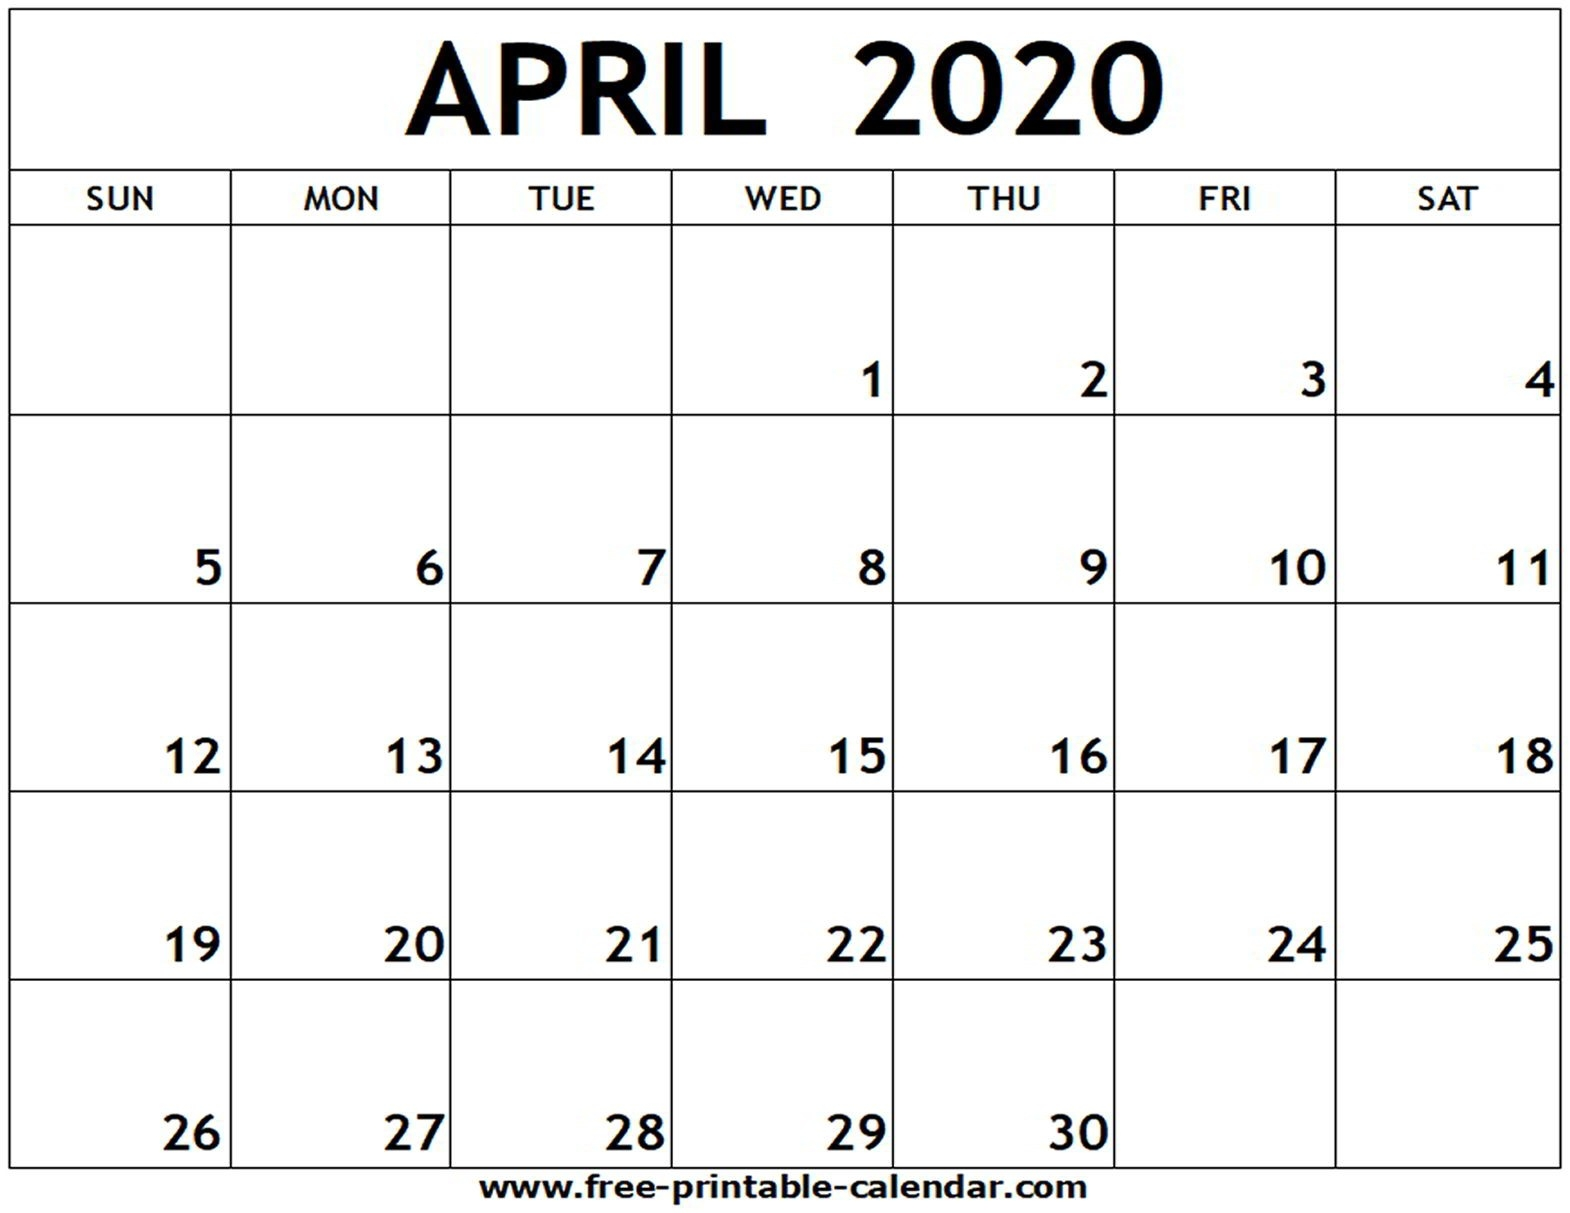 April 2020 Printable Calendar - Free-Printable-Calendar-June-August 2020 Blank Clanedars